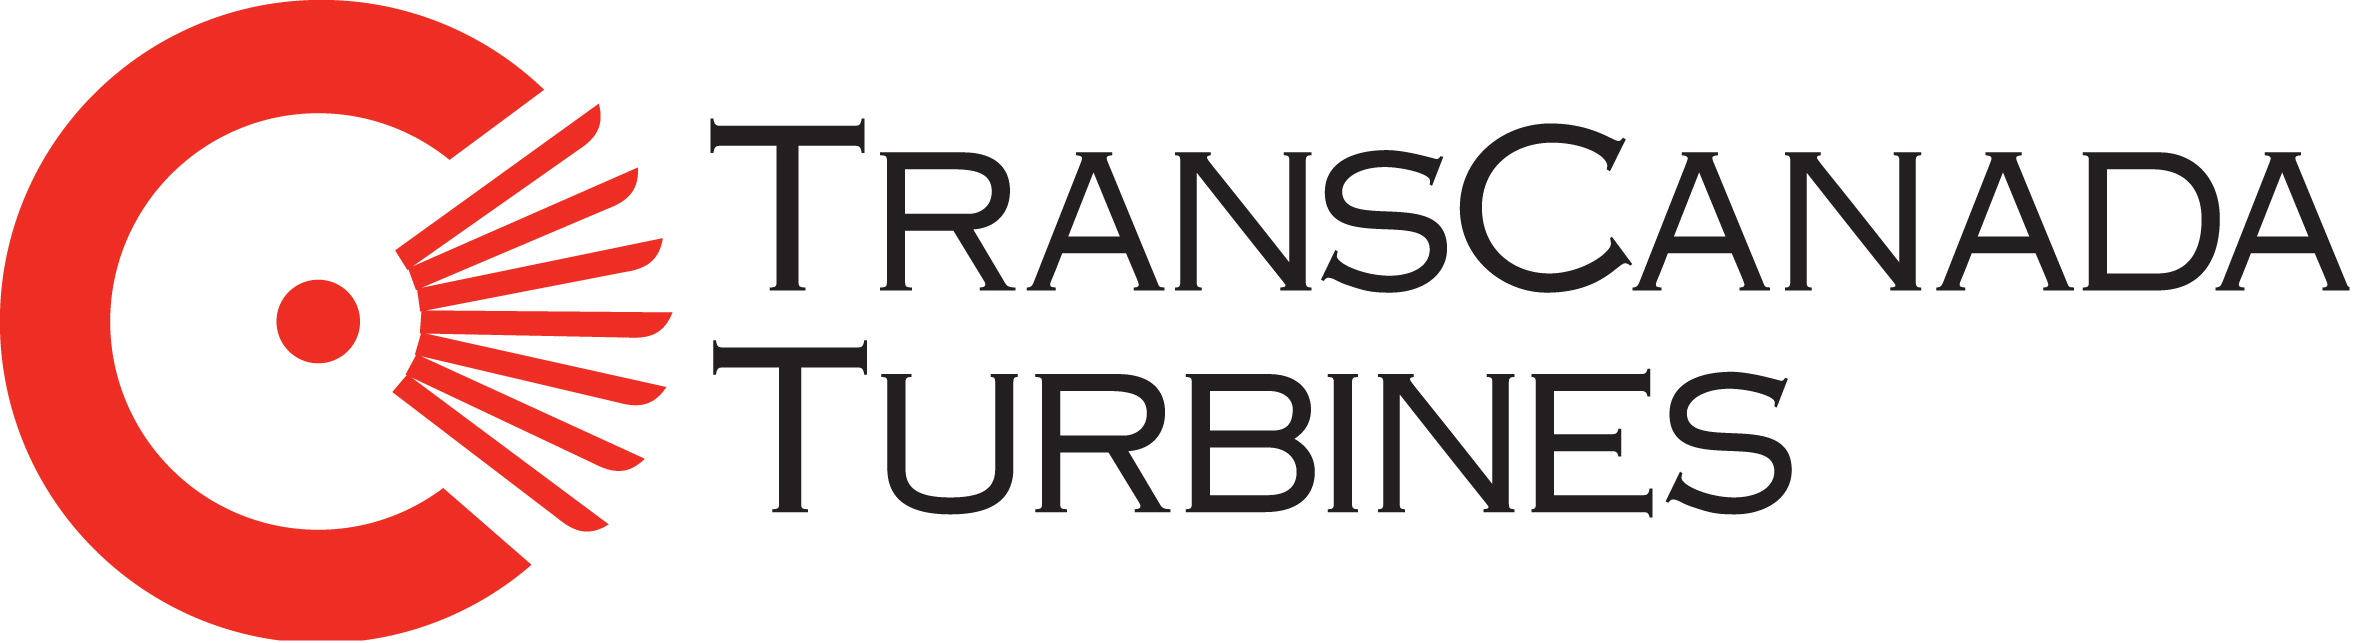 Trans Canada Turbines logo